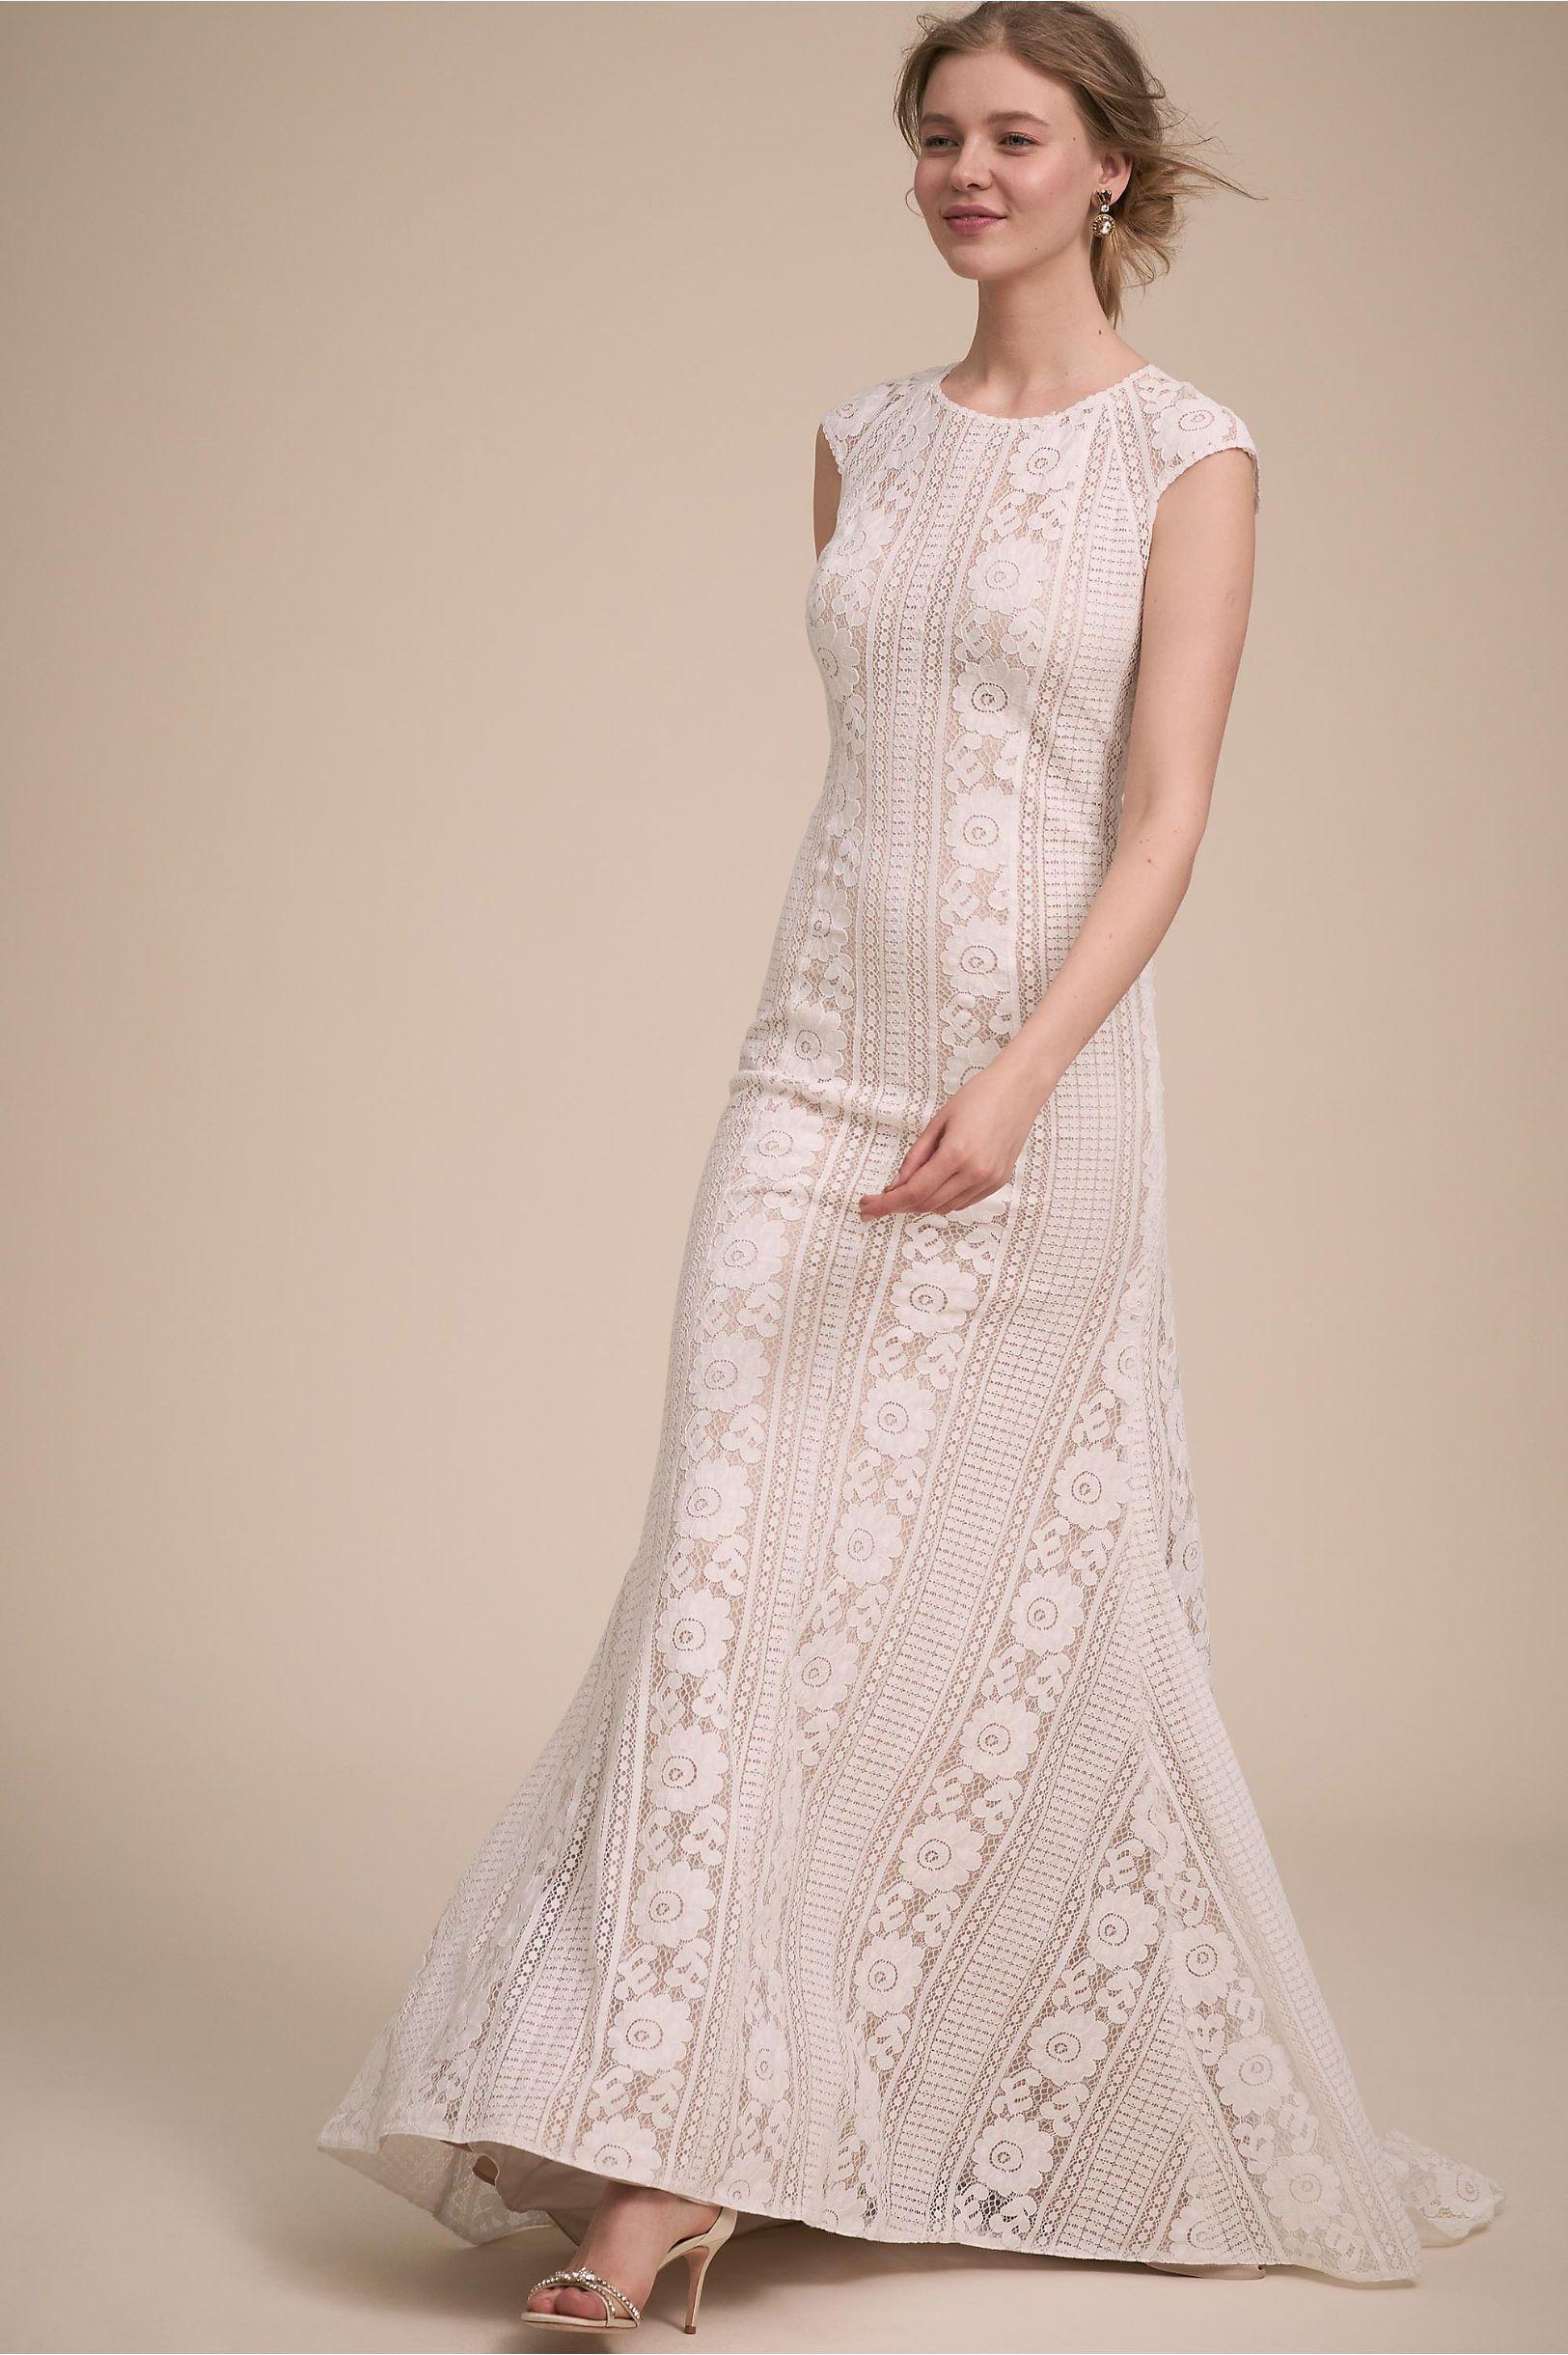 2015 Fashion sheer v neck lace applique blush wedding